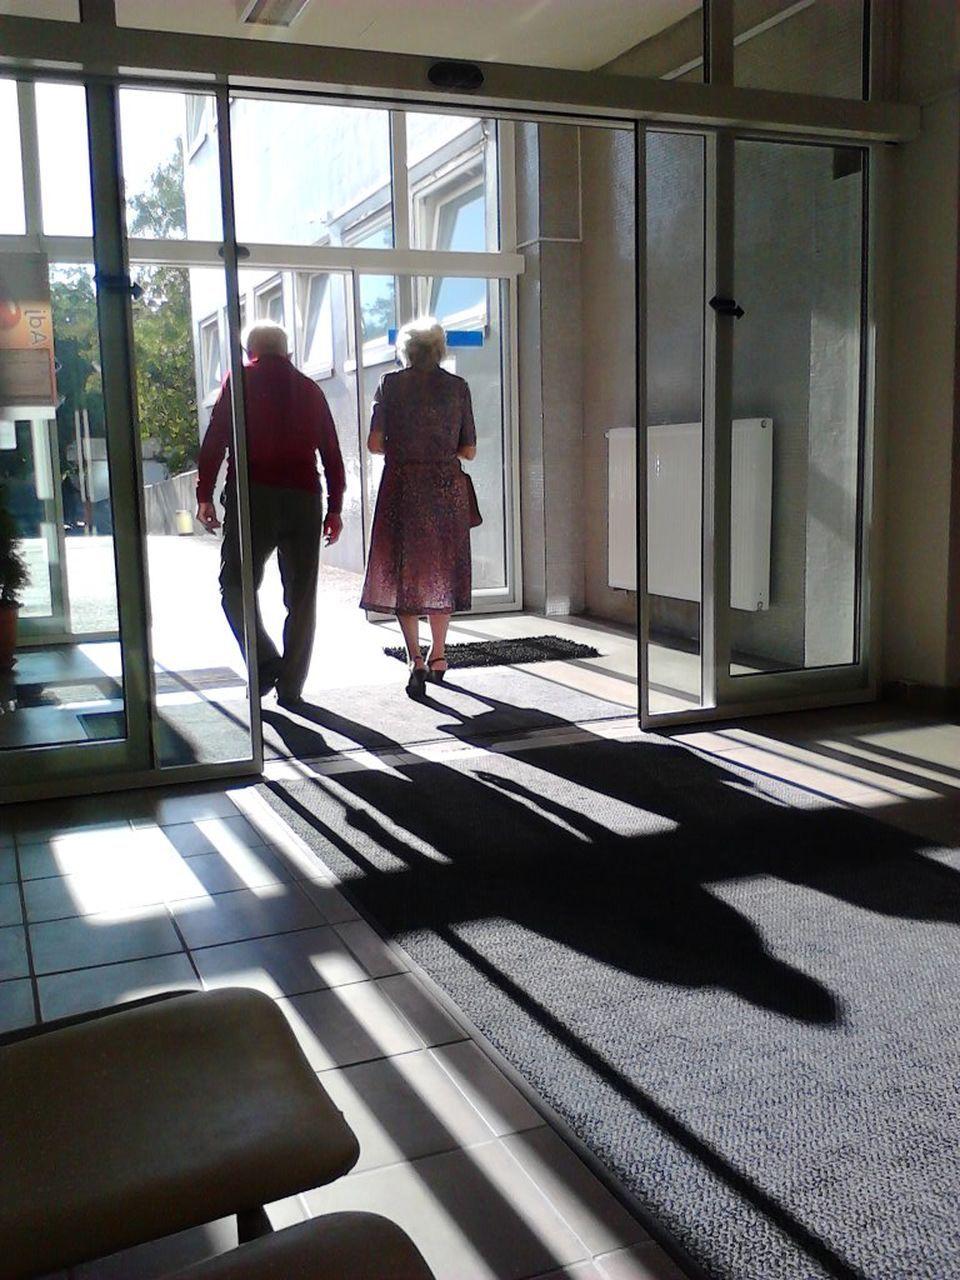 shadow, walking, full length, sunlight, indoors, friendship, women, day